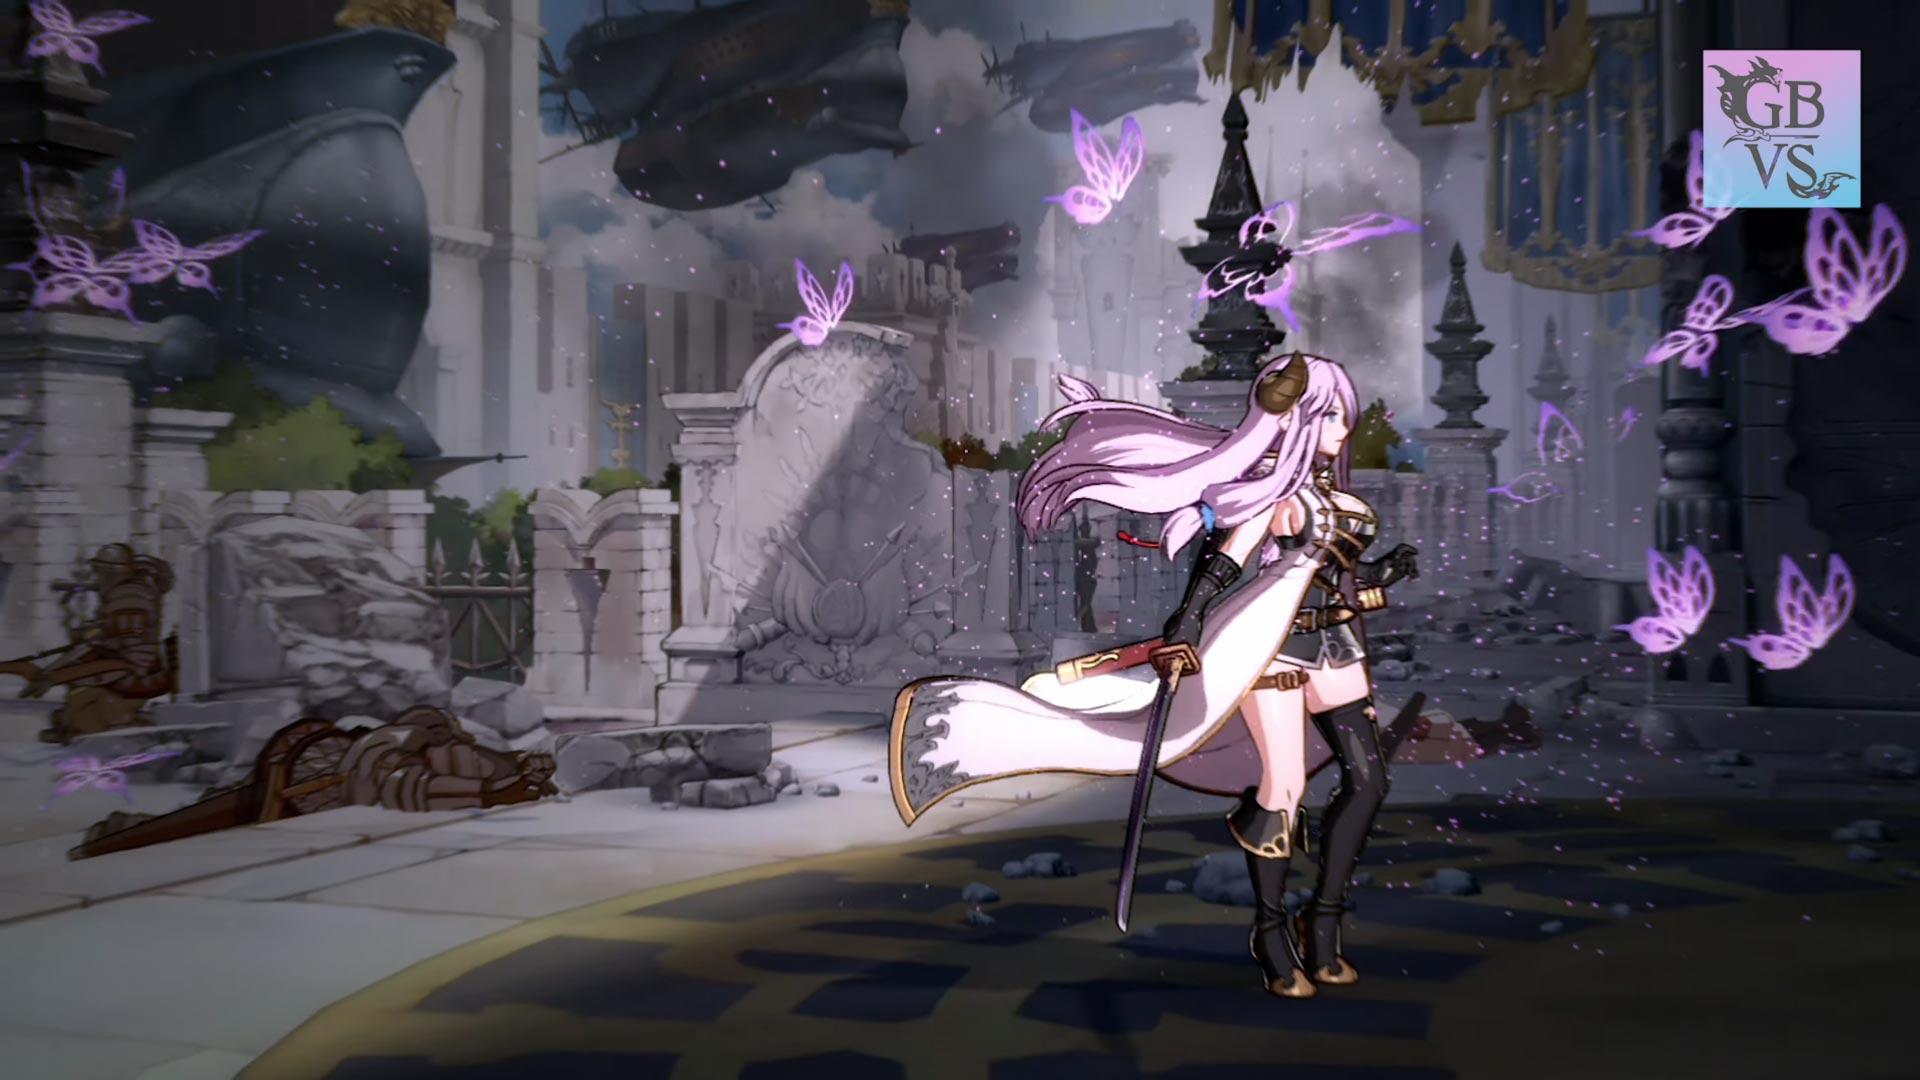 Granblue Fantasy Versus Narmaya Trailer Gallery 5 out of 12 image gallery